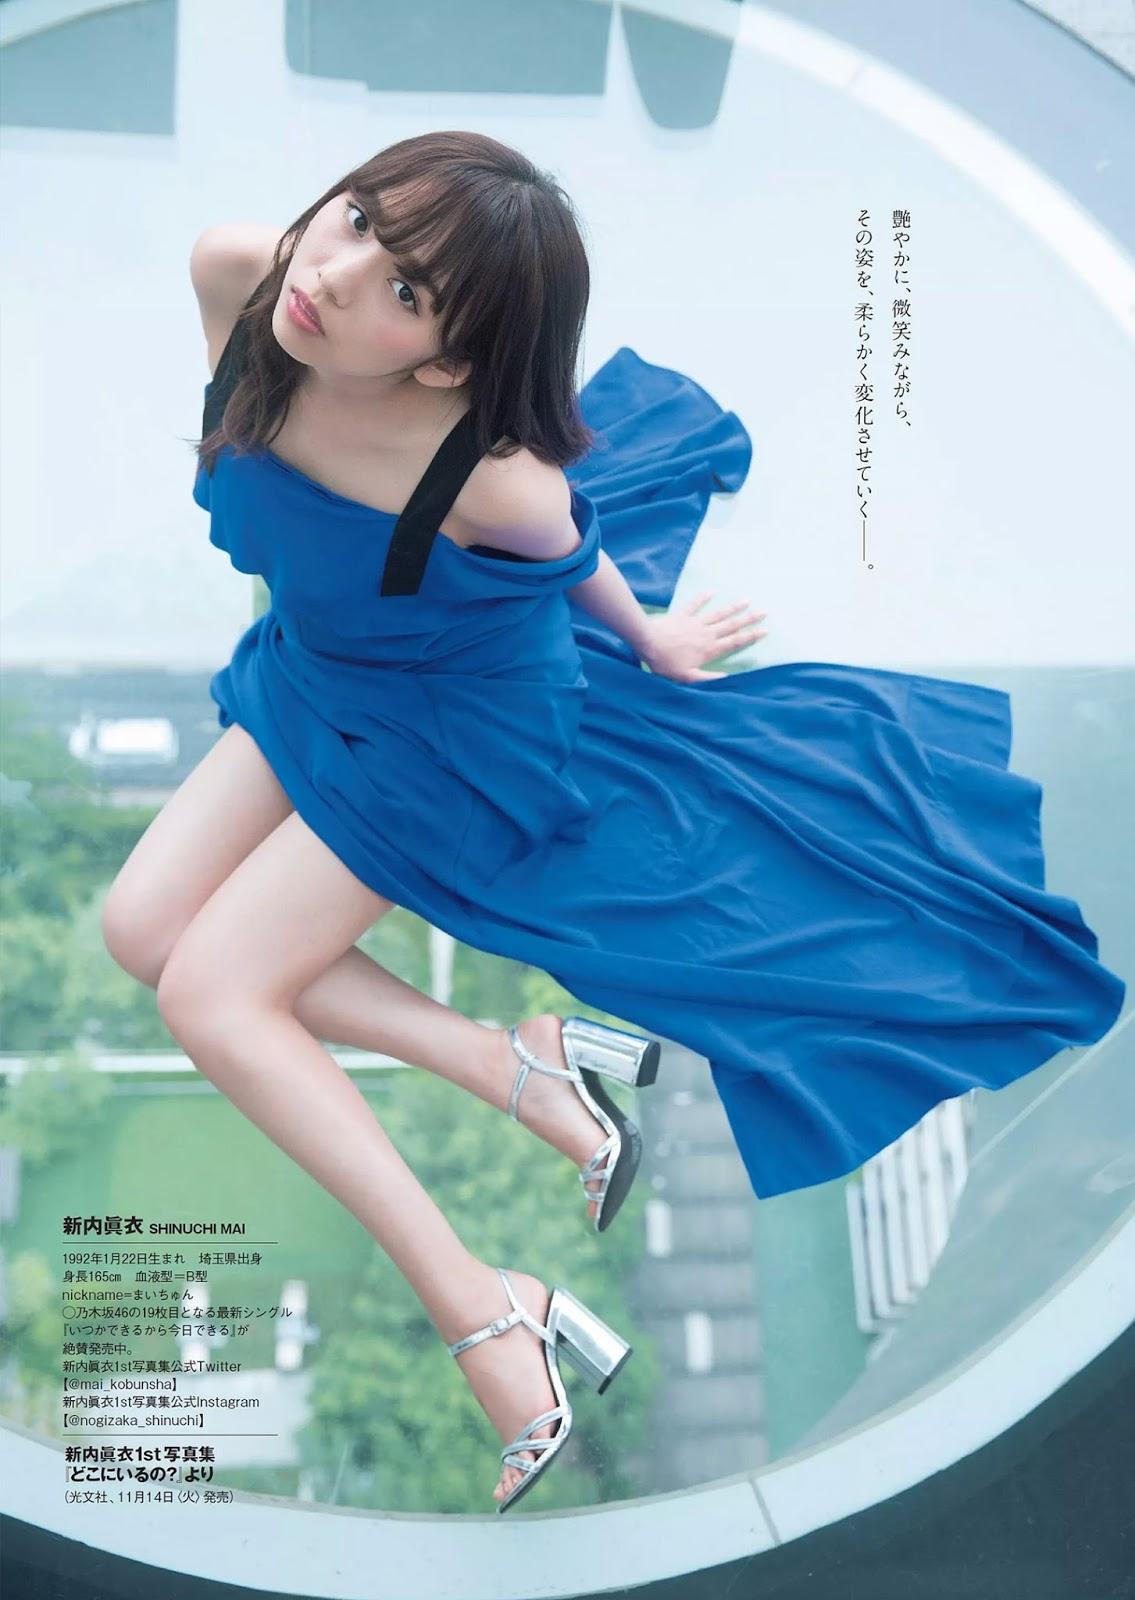 Shinuchi Mai 新内眞衣, Weekly Playboy 2017 No.48 (週刊プレイボーイ 2017年48号)